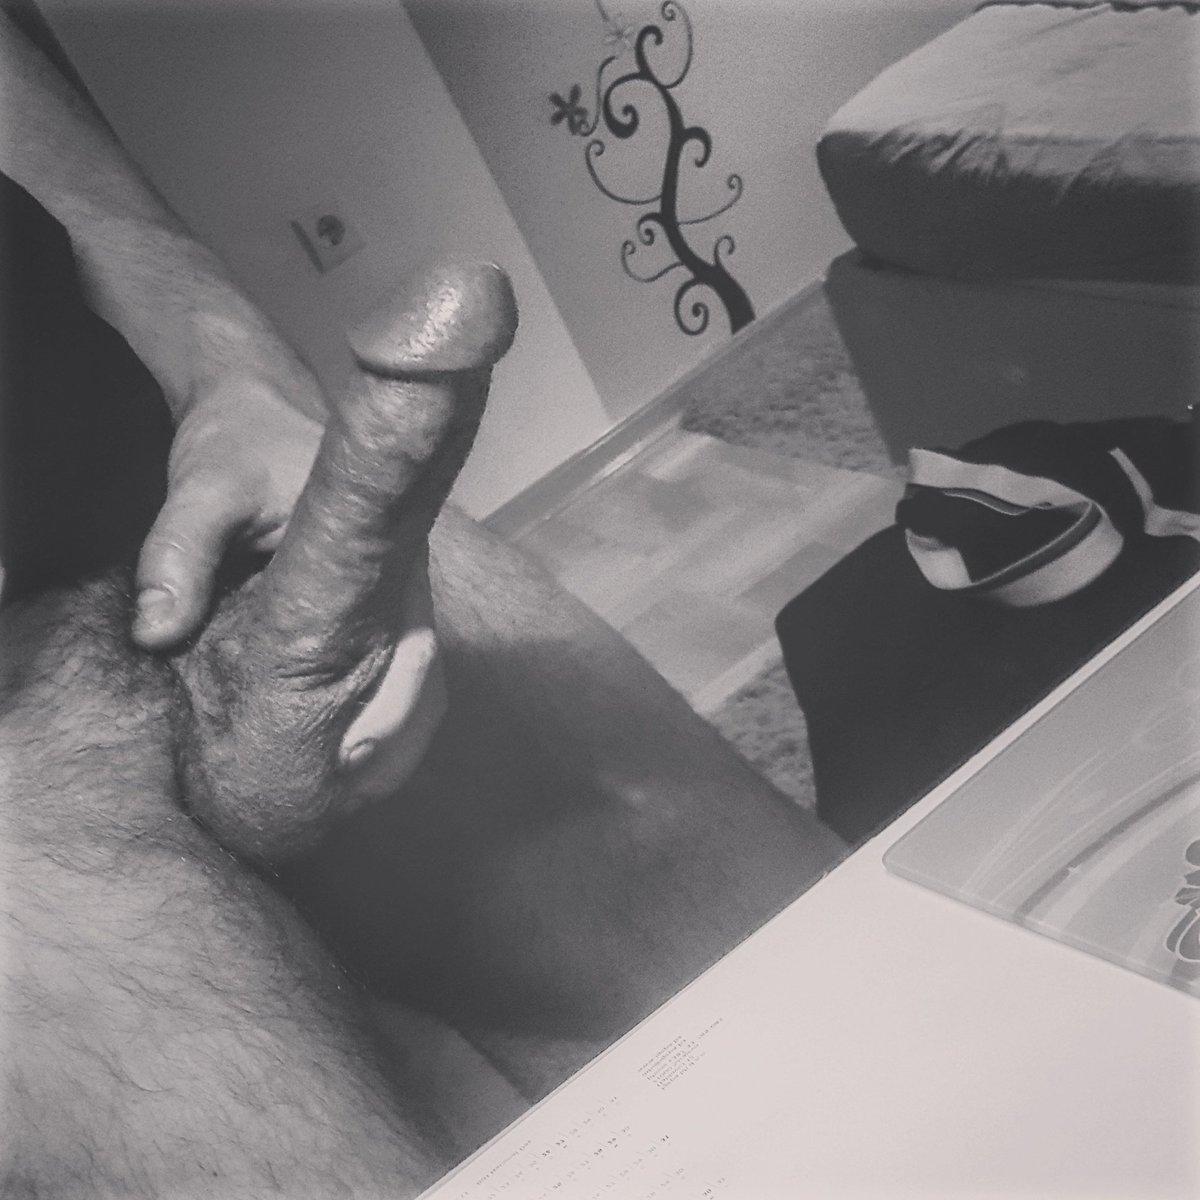 Nude Selfie 7361